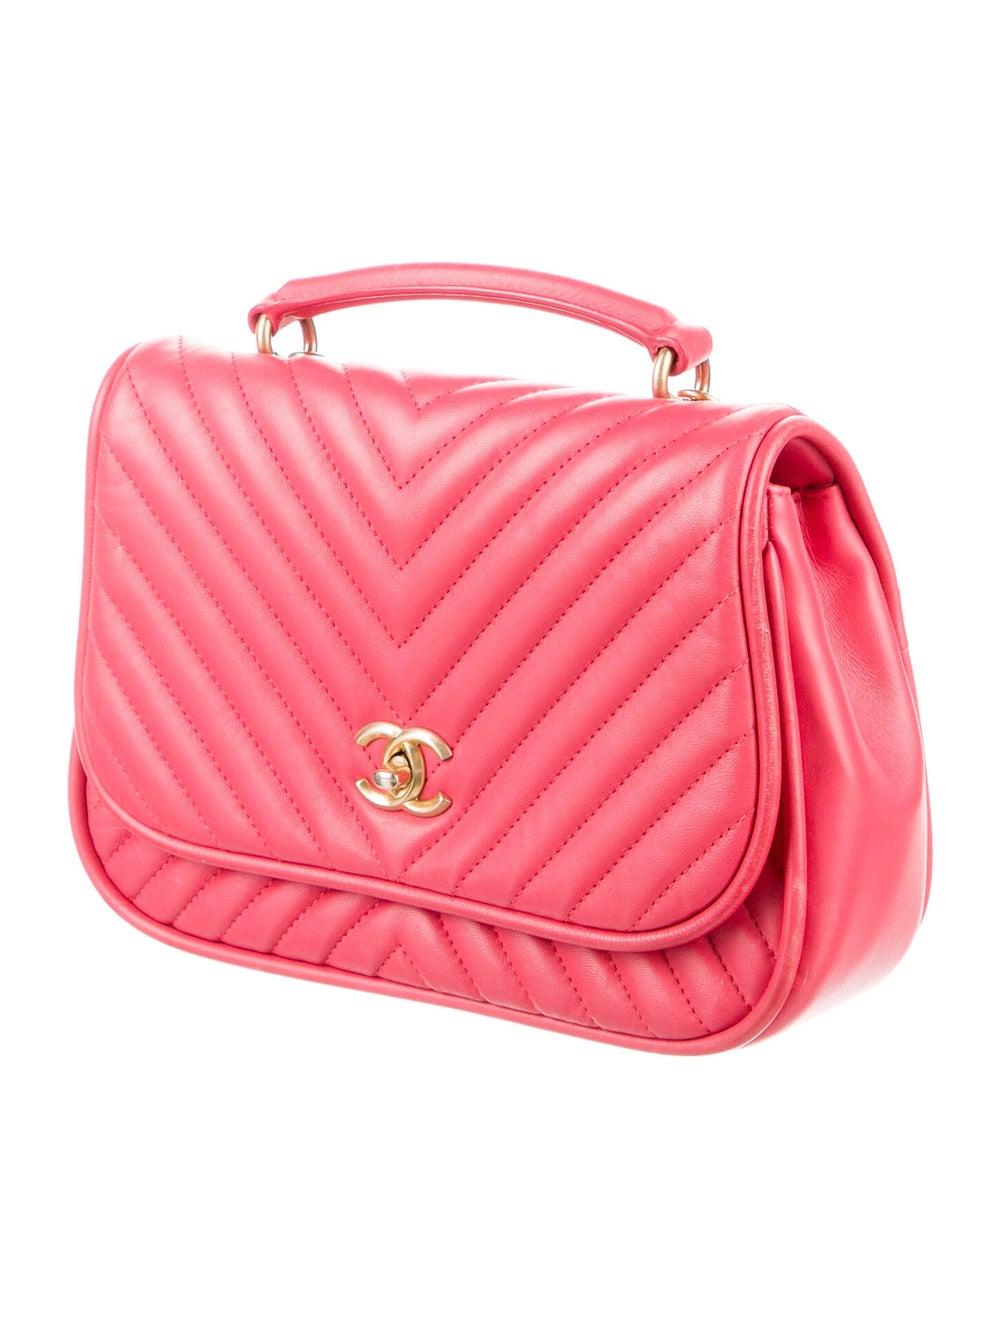 Chanel Reversed Chevron Bag Pink - image 3